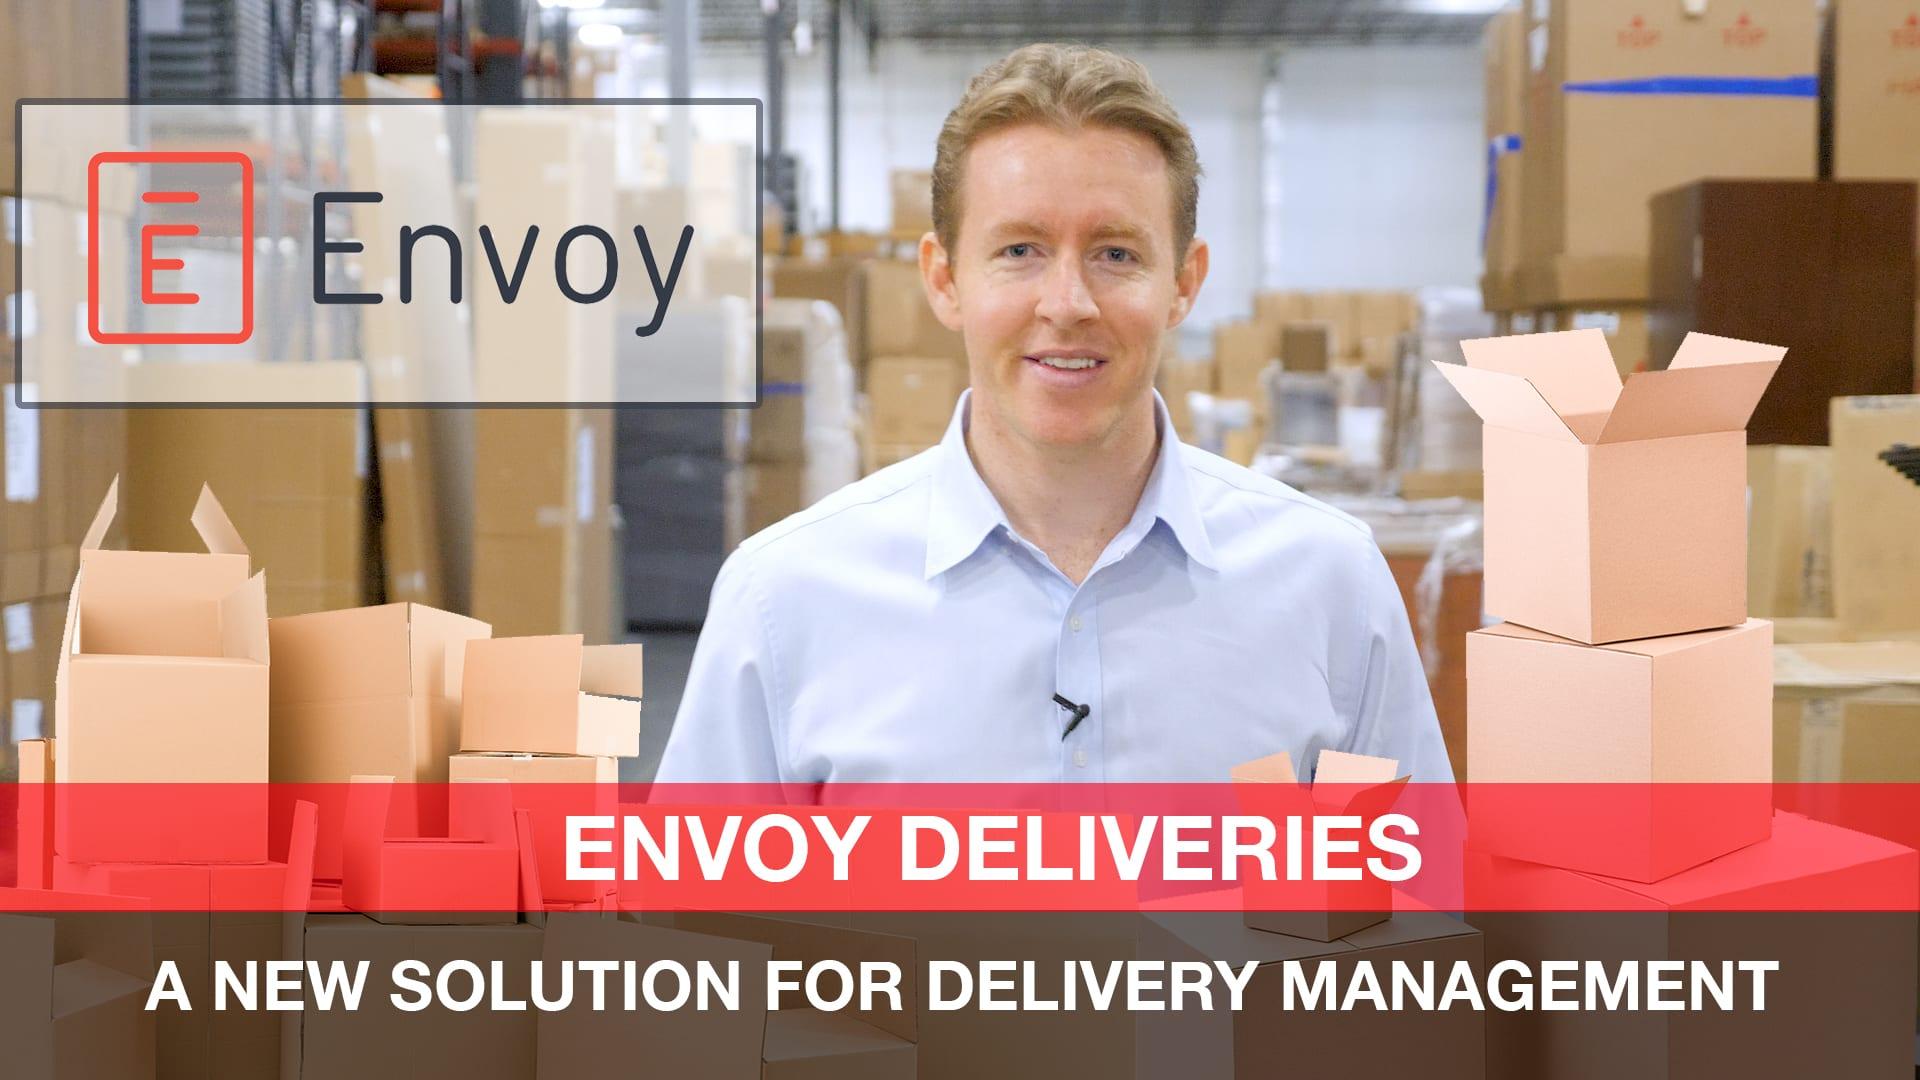 envoy deliveries app packaged technology